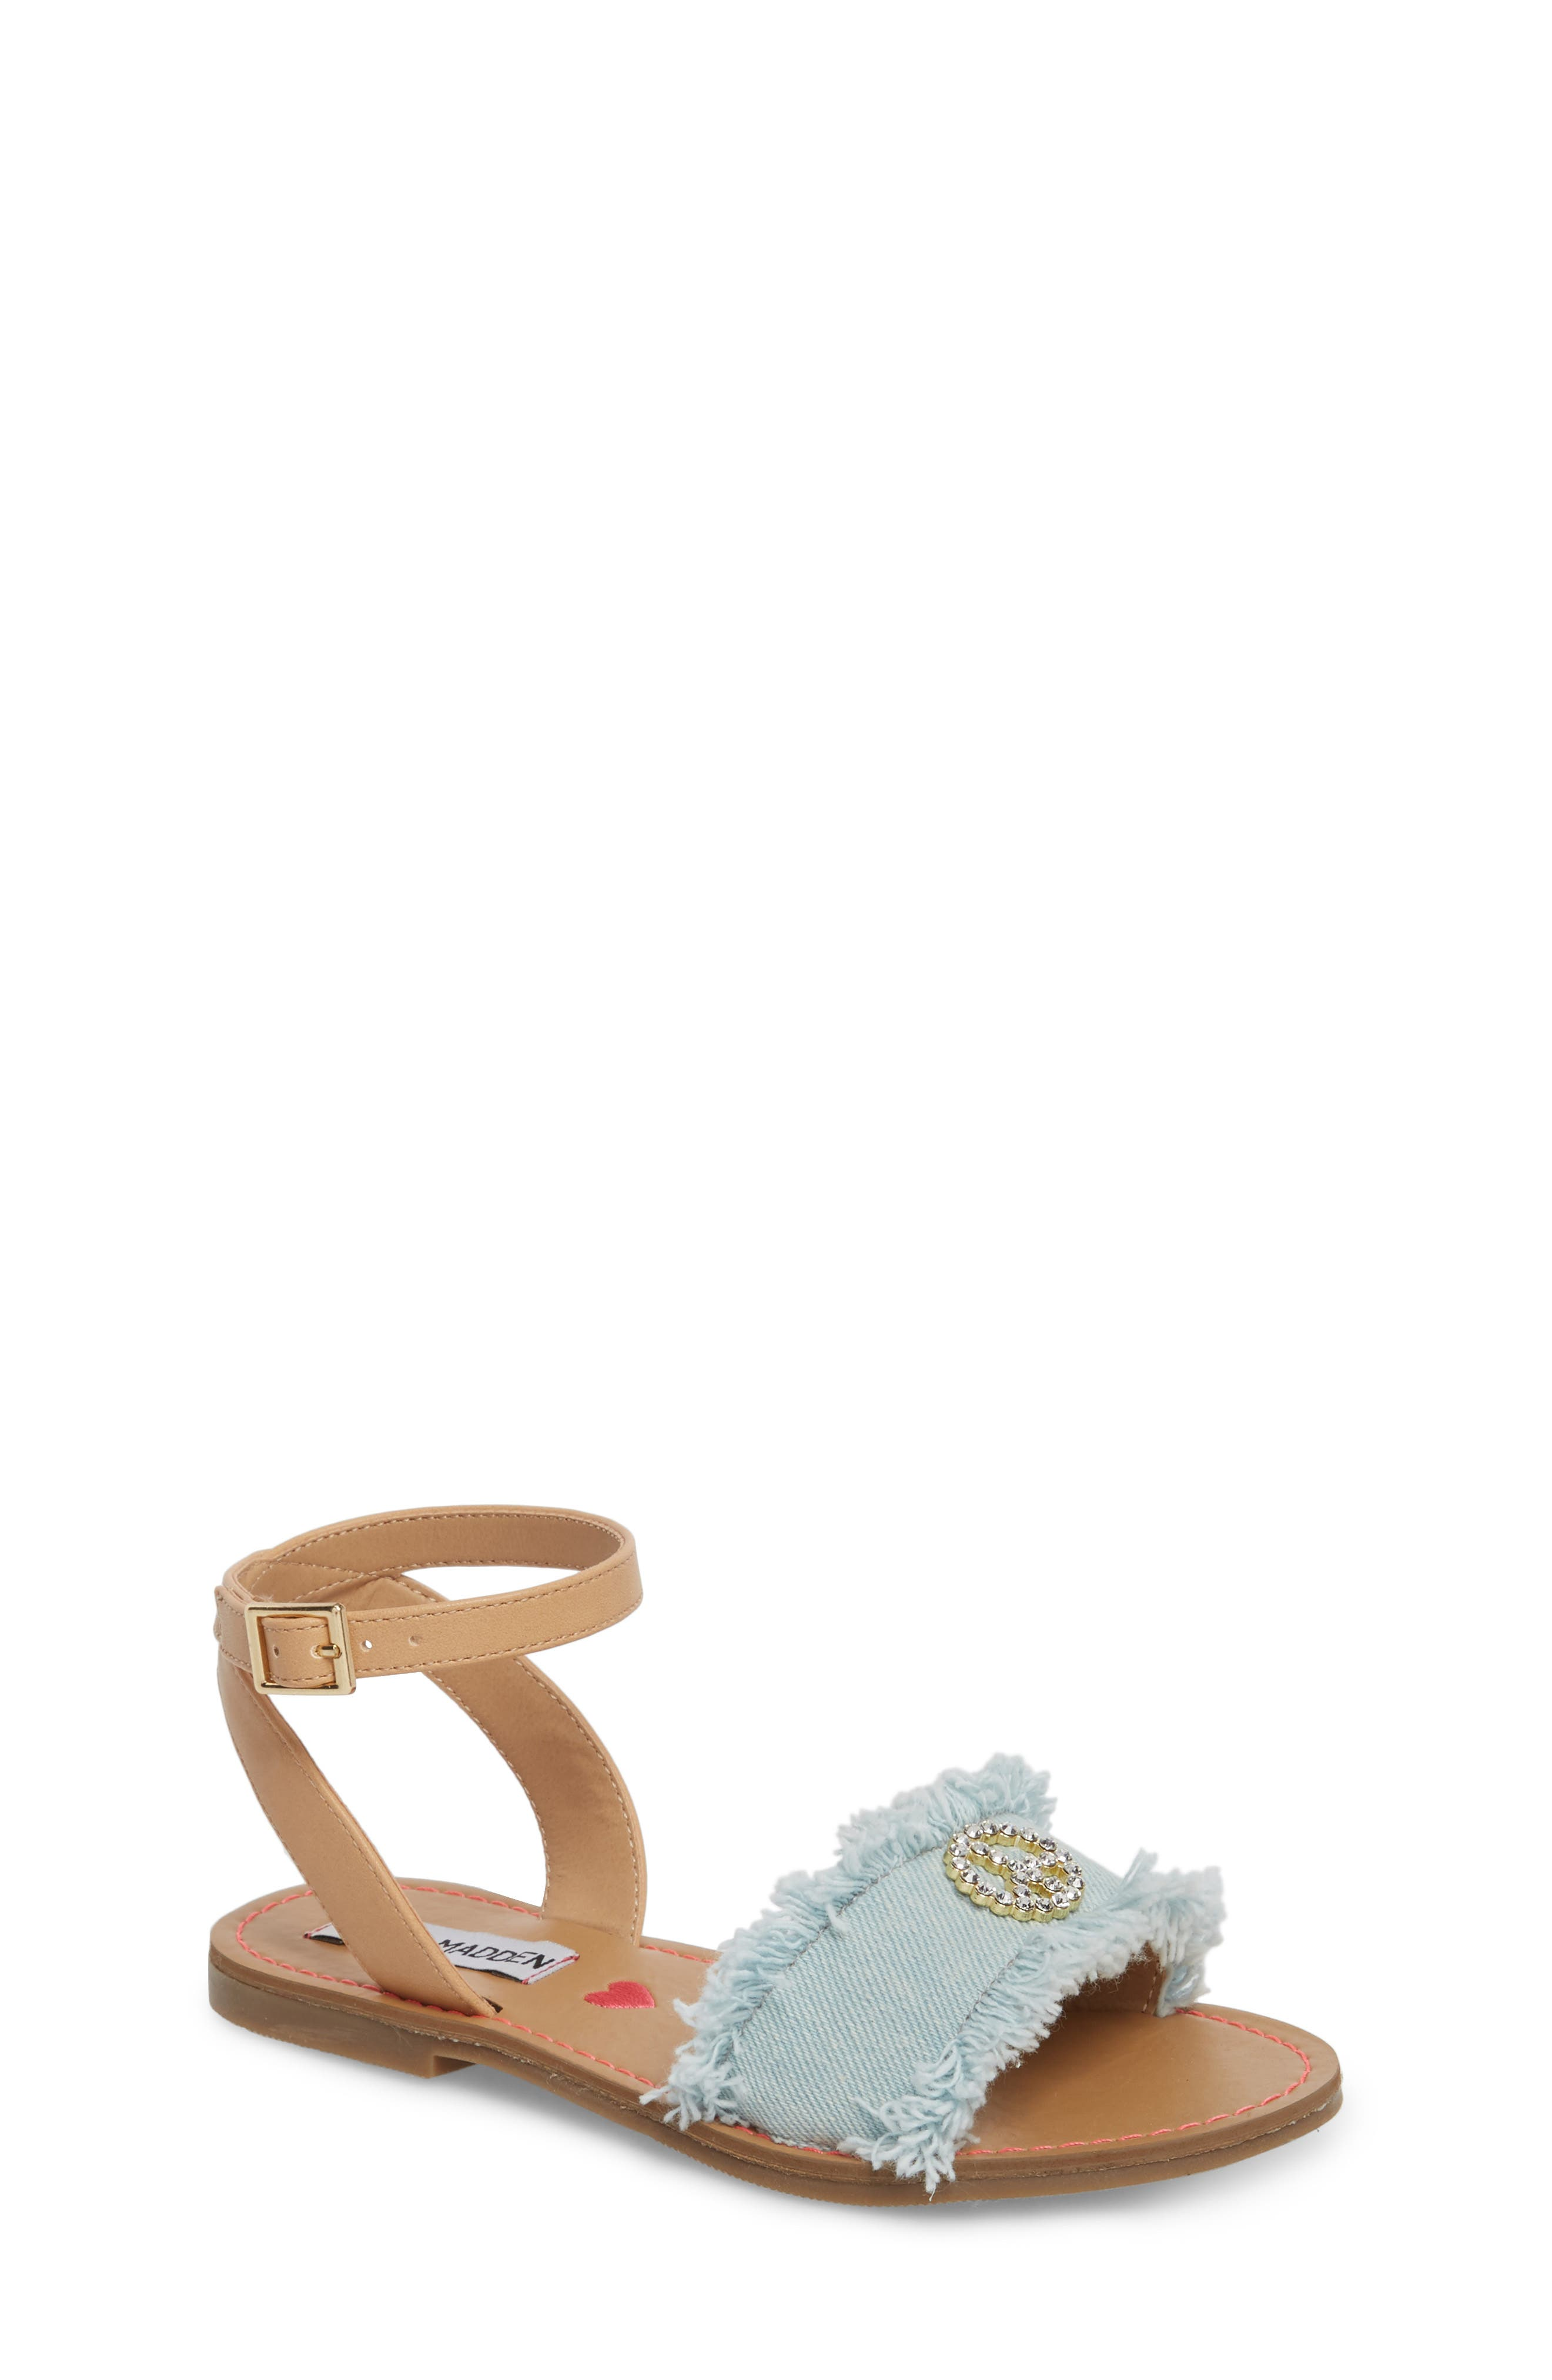 JVILLA Ankle Strap Sandal,                         Main,                         color, 401